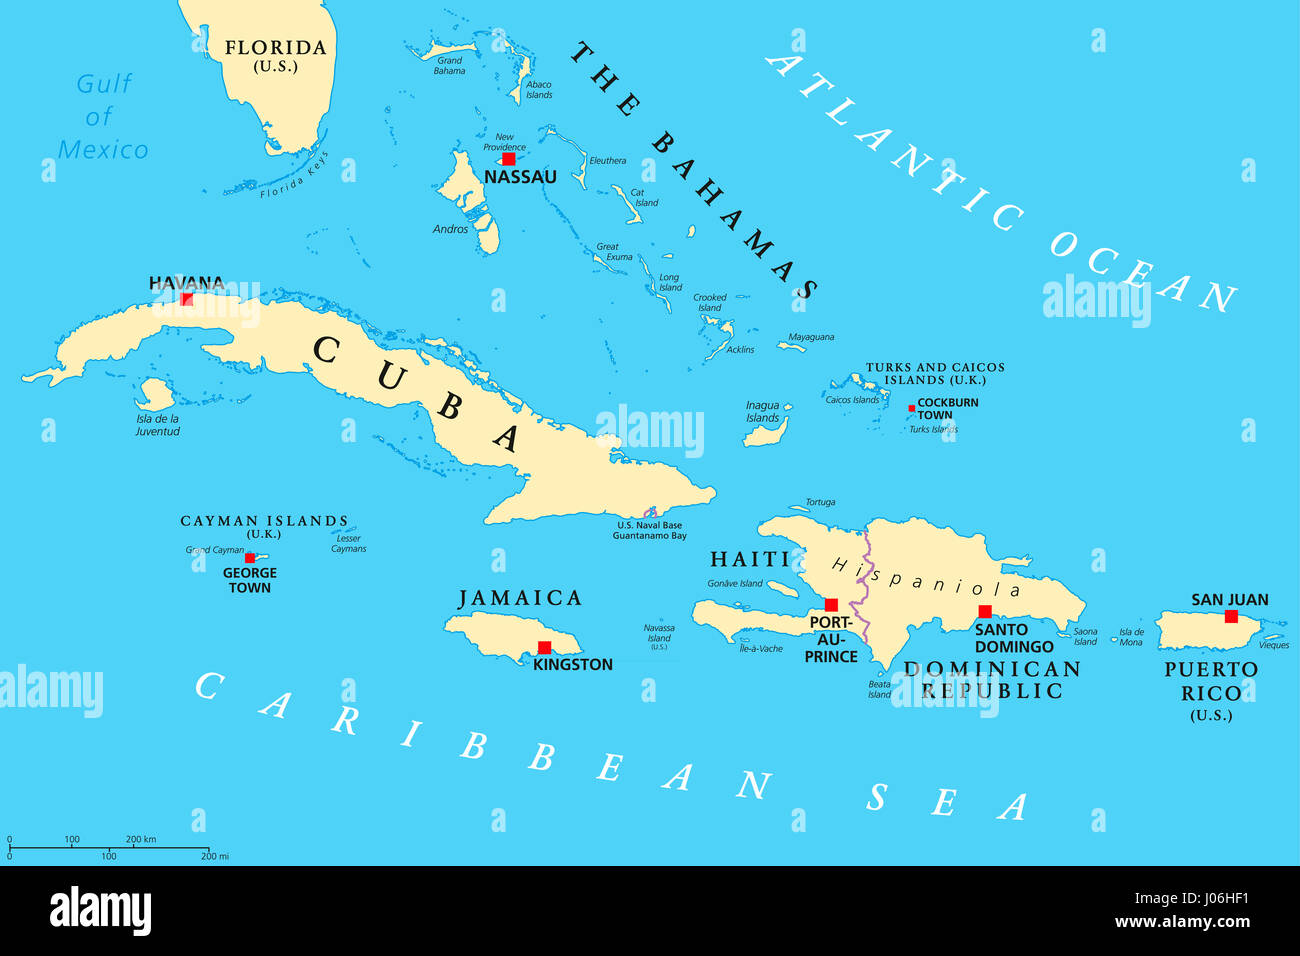 Politische Karte Der Großen Antillen Karibik Kuba Jamaika Haiti